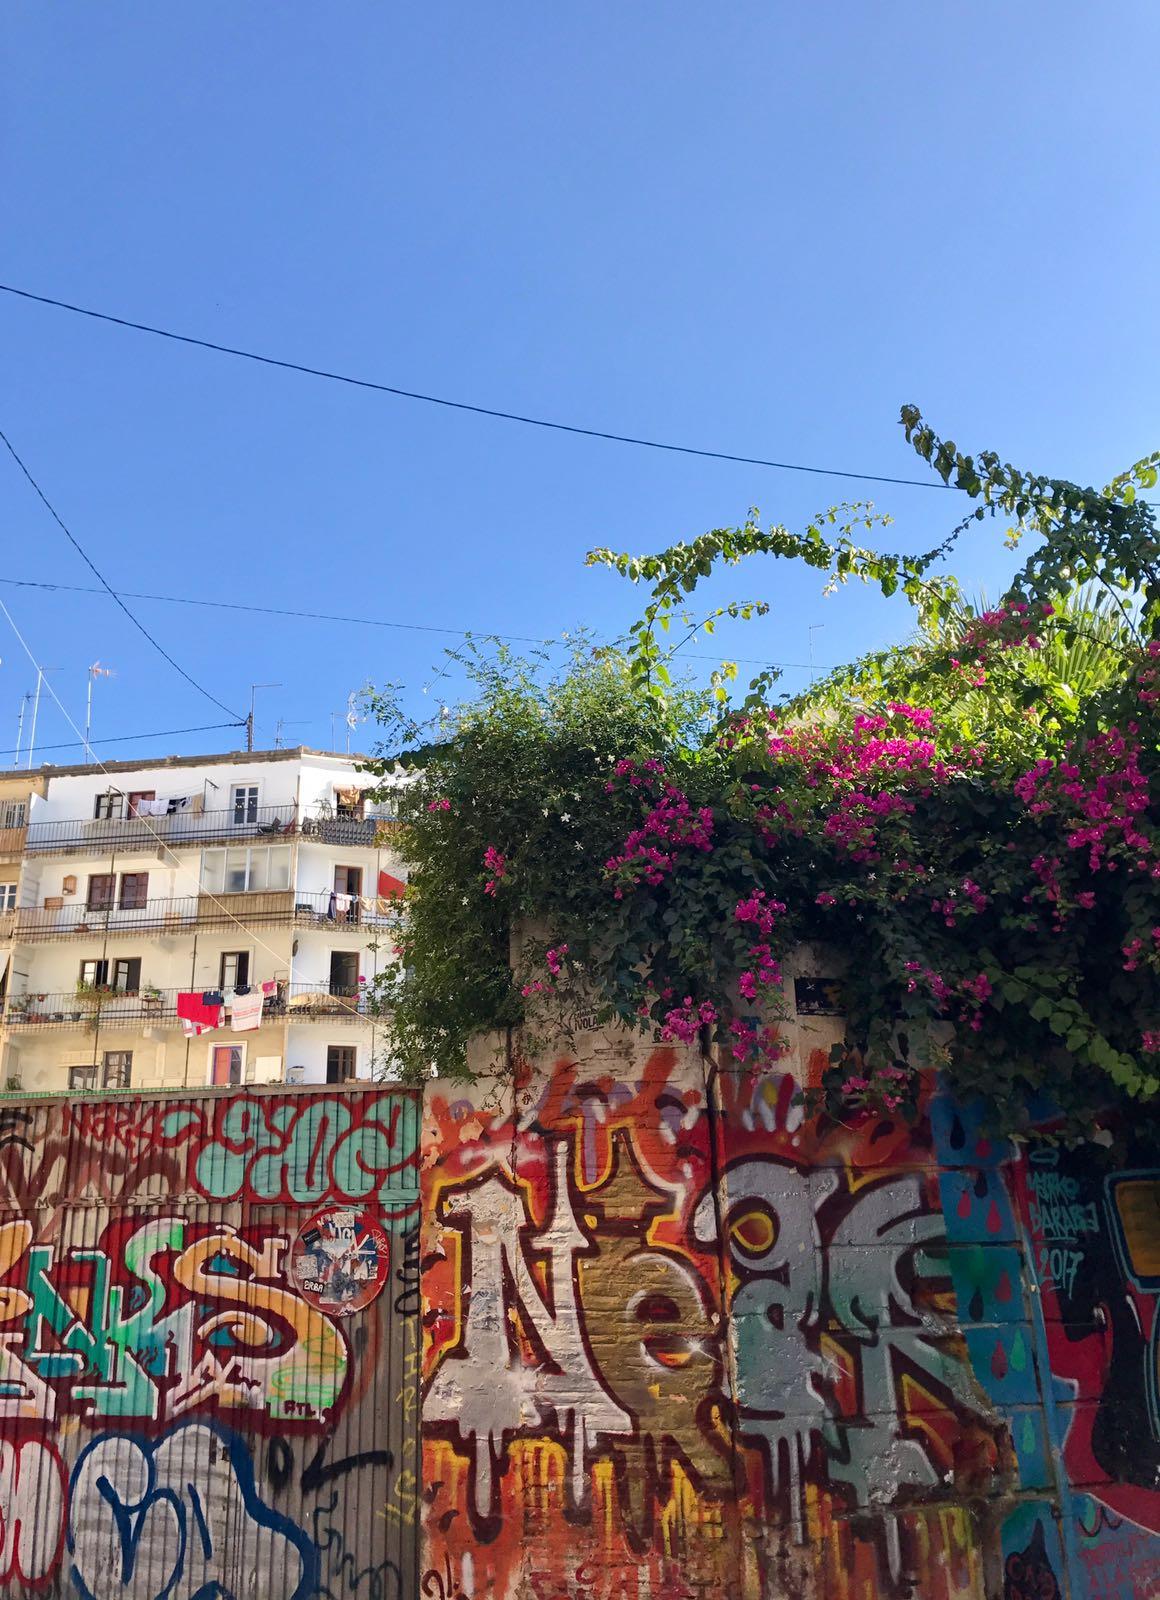 Wall of graffiti alongside the top of a tower block below a blue sky